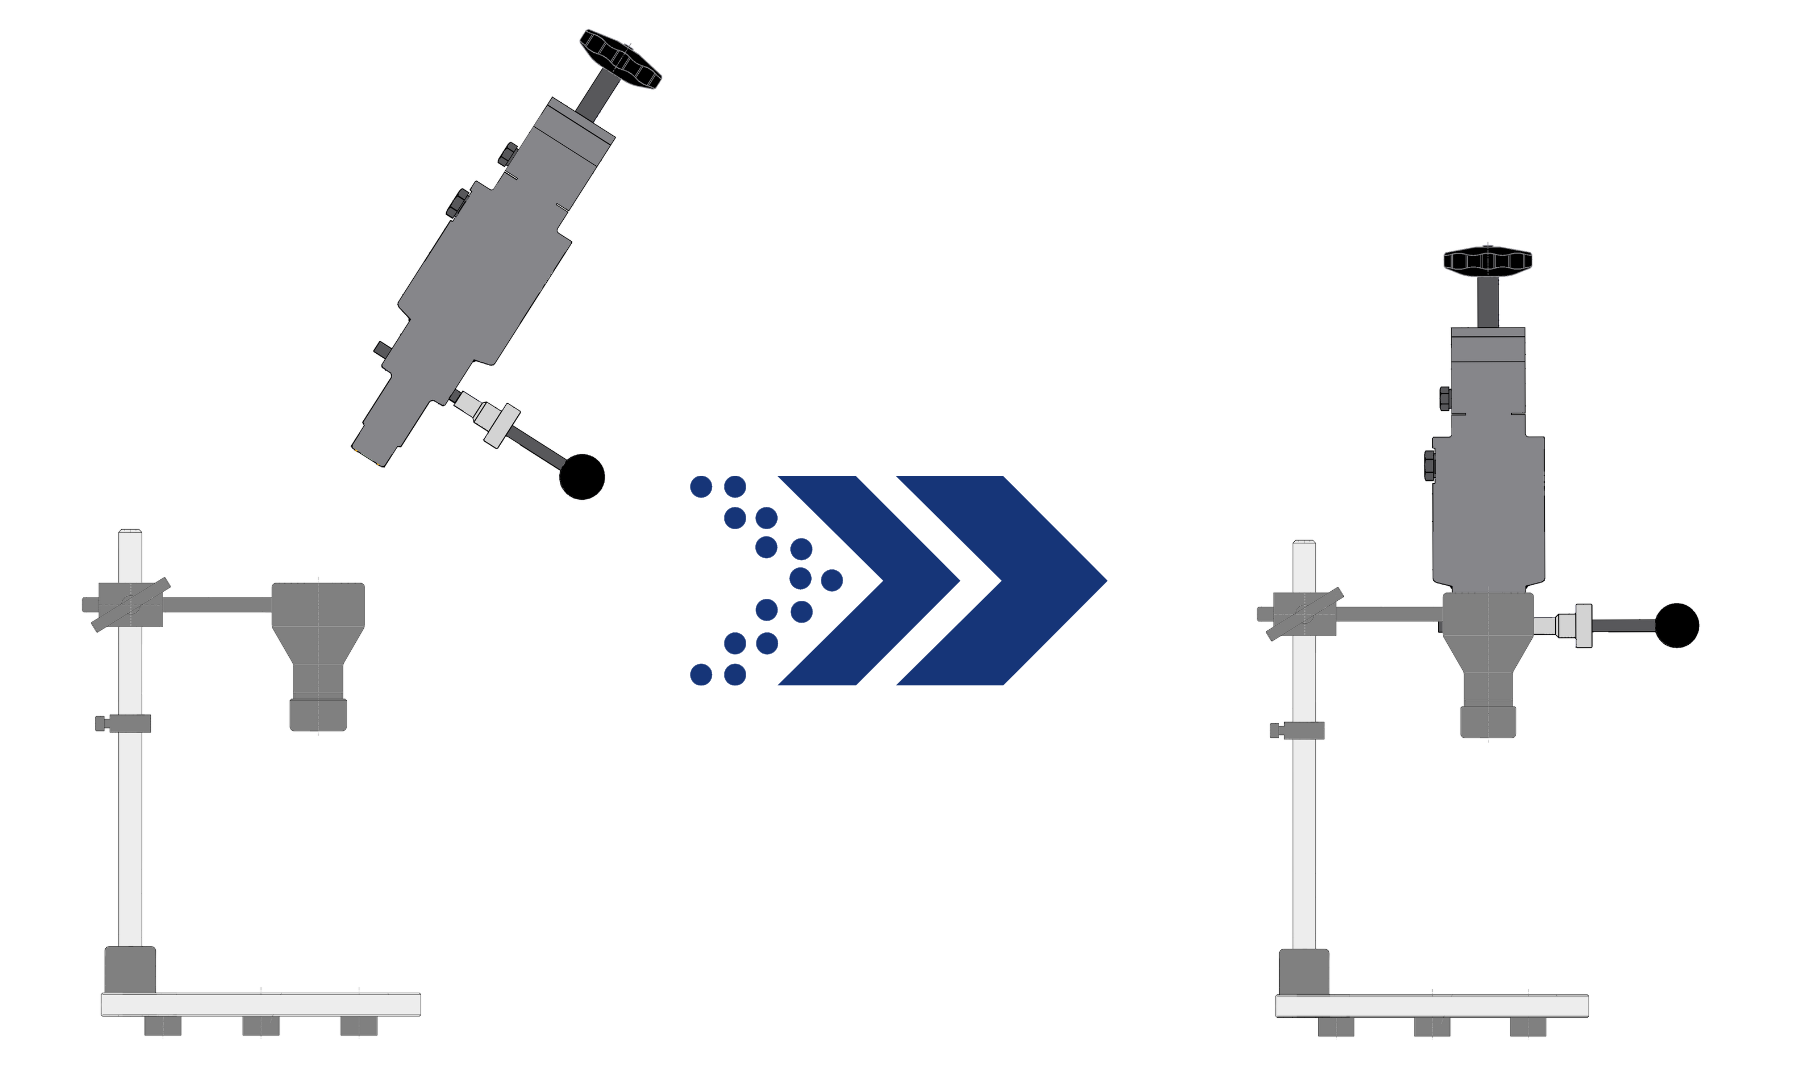 Sample system illustration